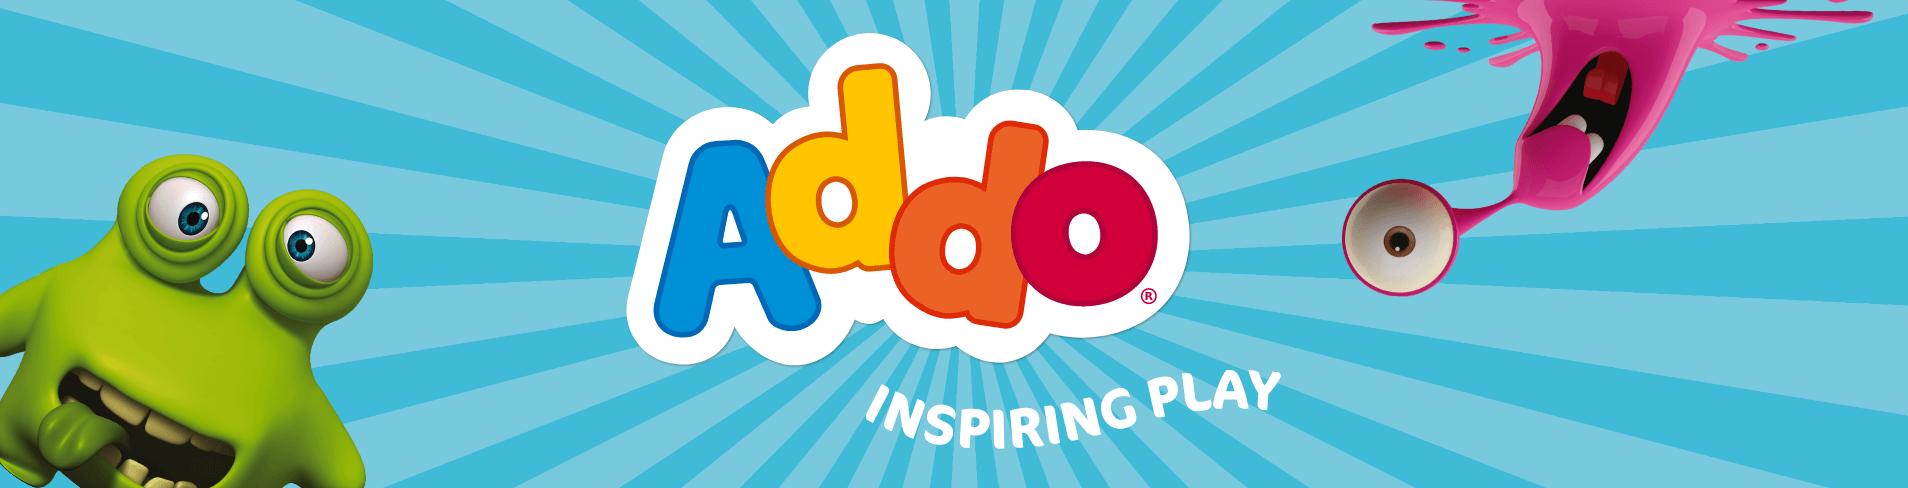 Addo Inspiring Play